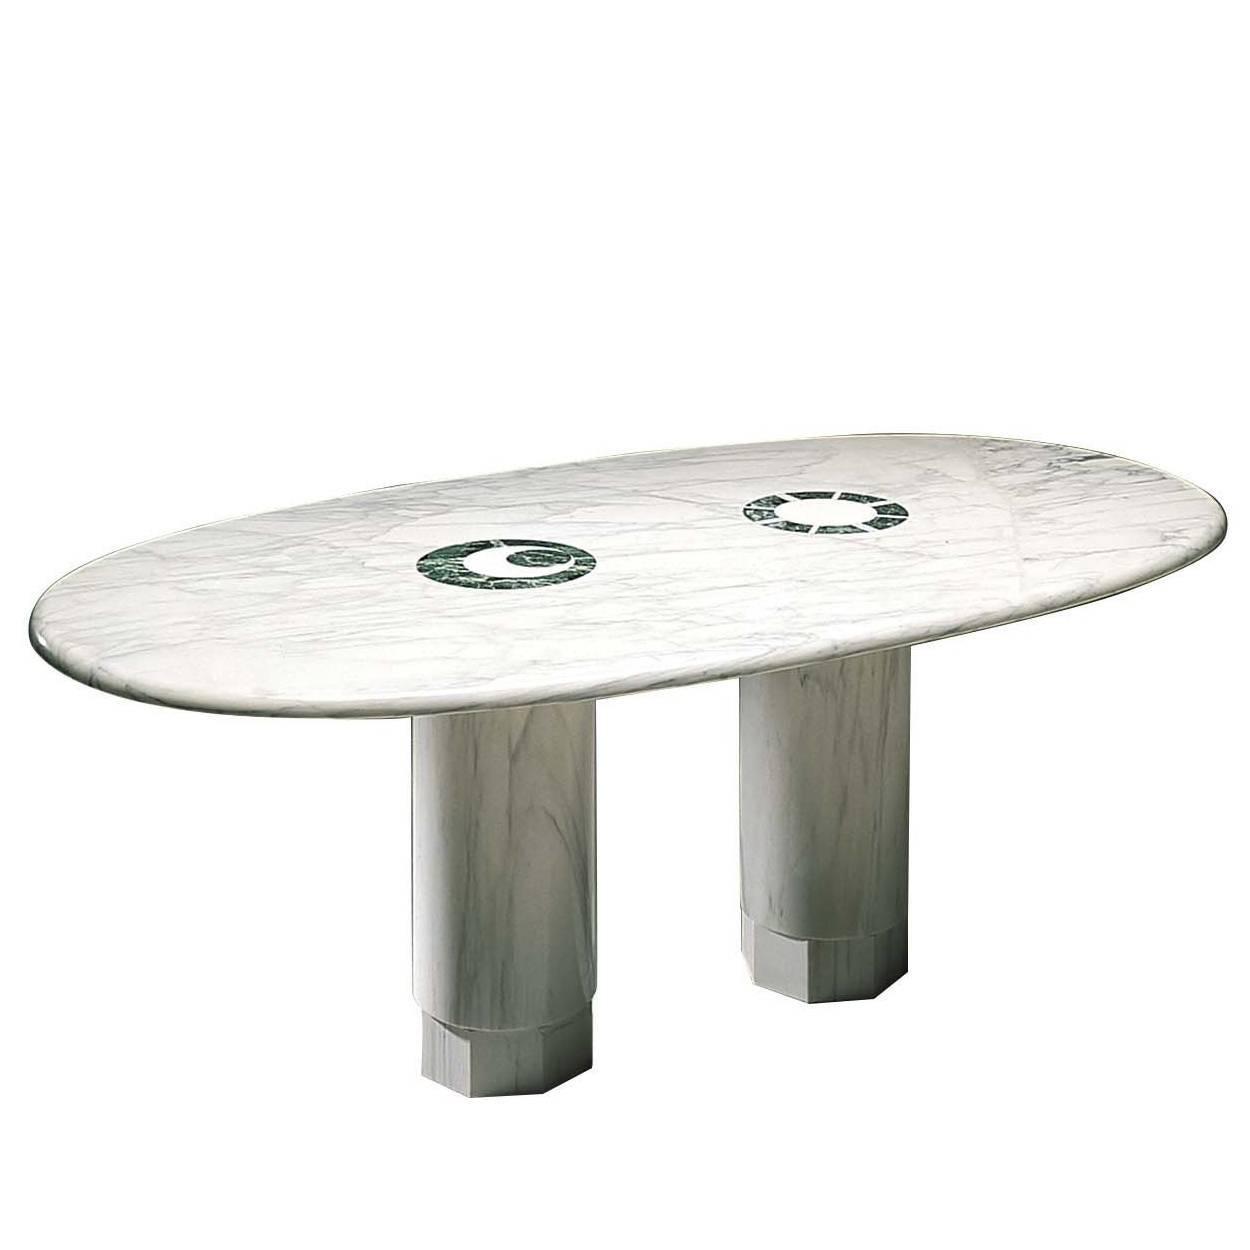 Sole & Luna Table by Adolfo Natalini